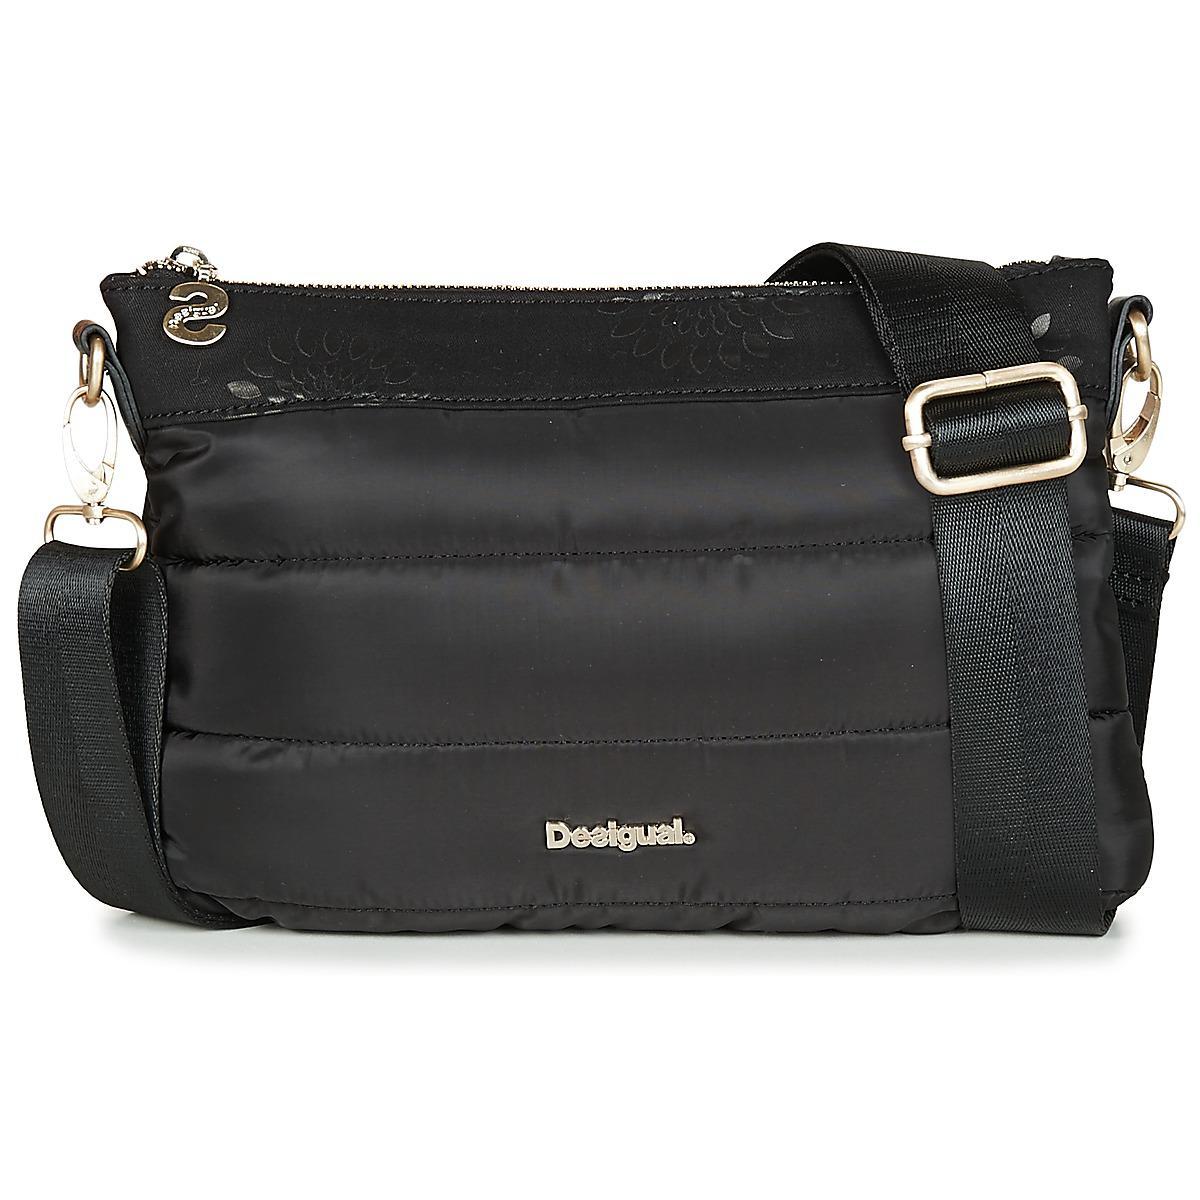 a96dccdeac776 Desigual Bols Magic Durban Women s Shoulder Bag In Black in Black ...